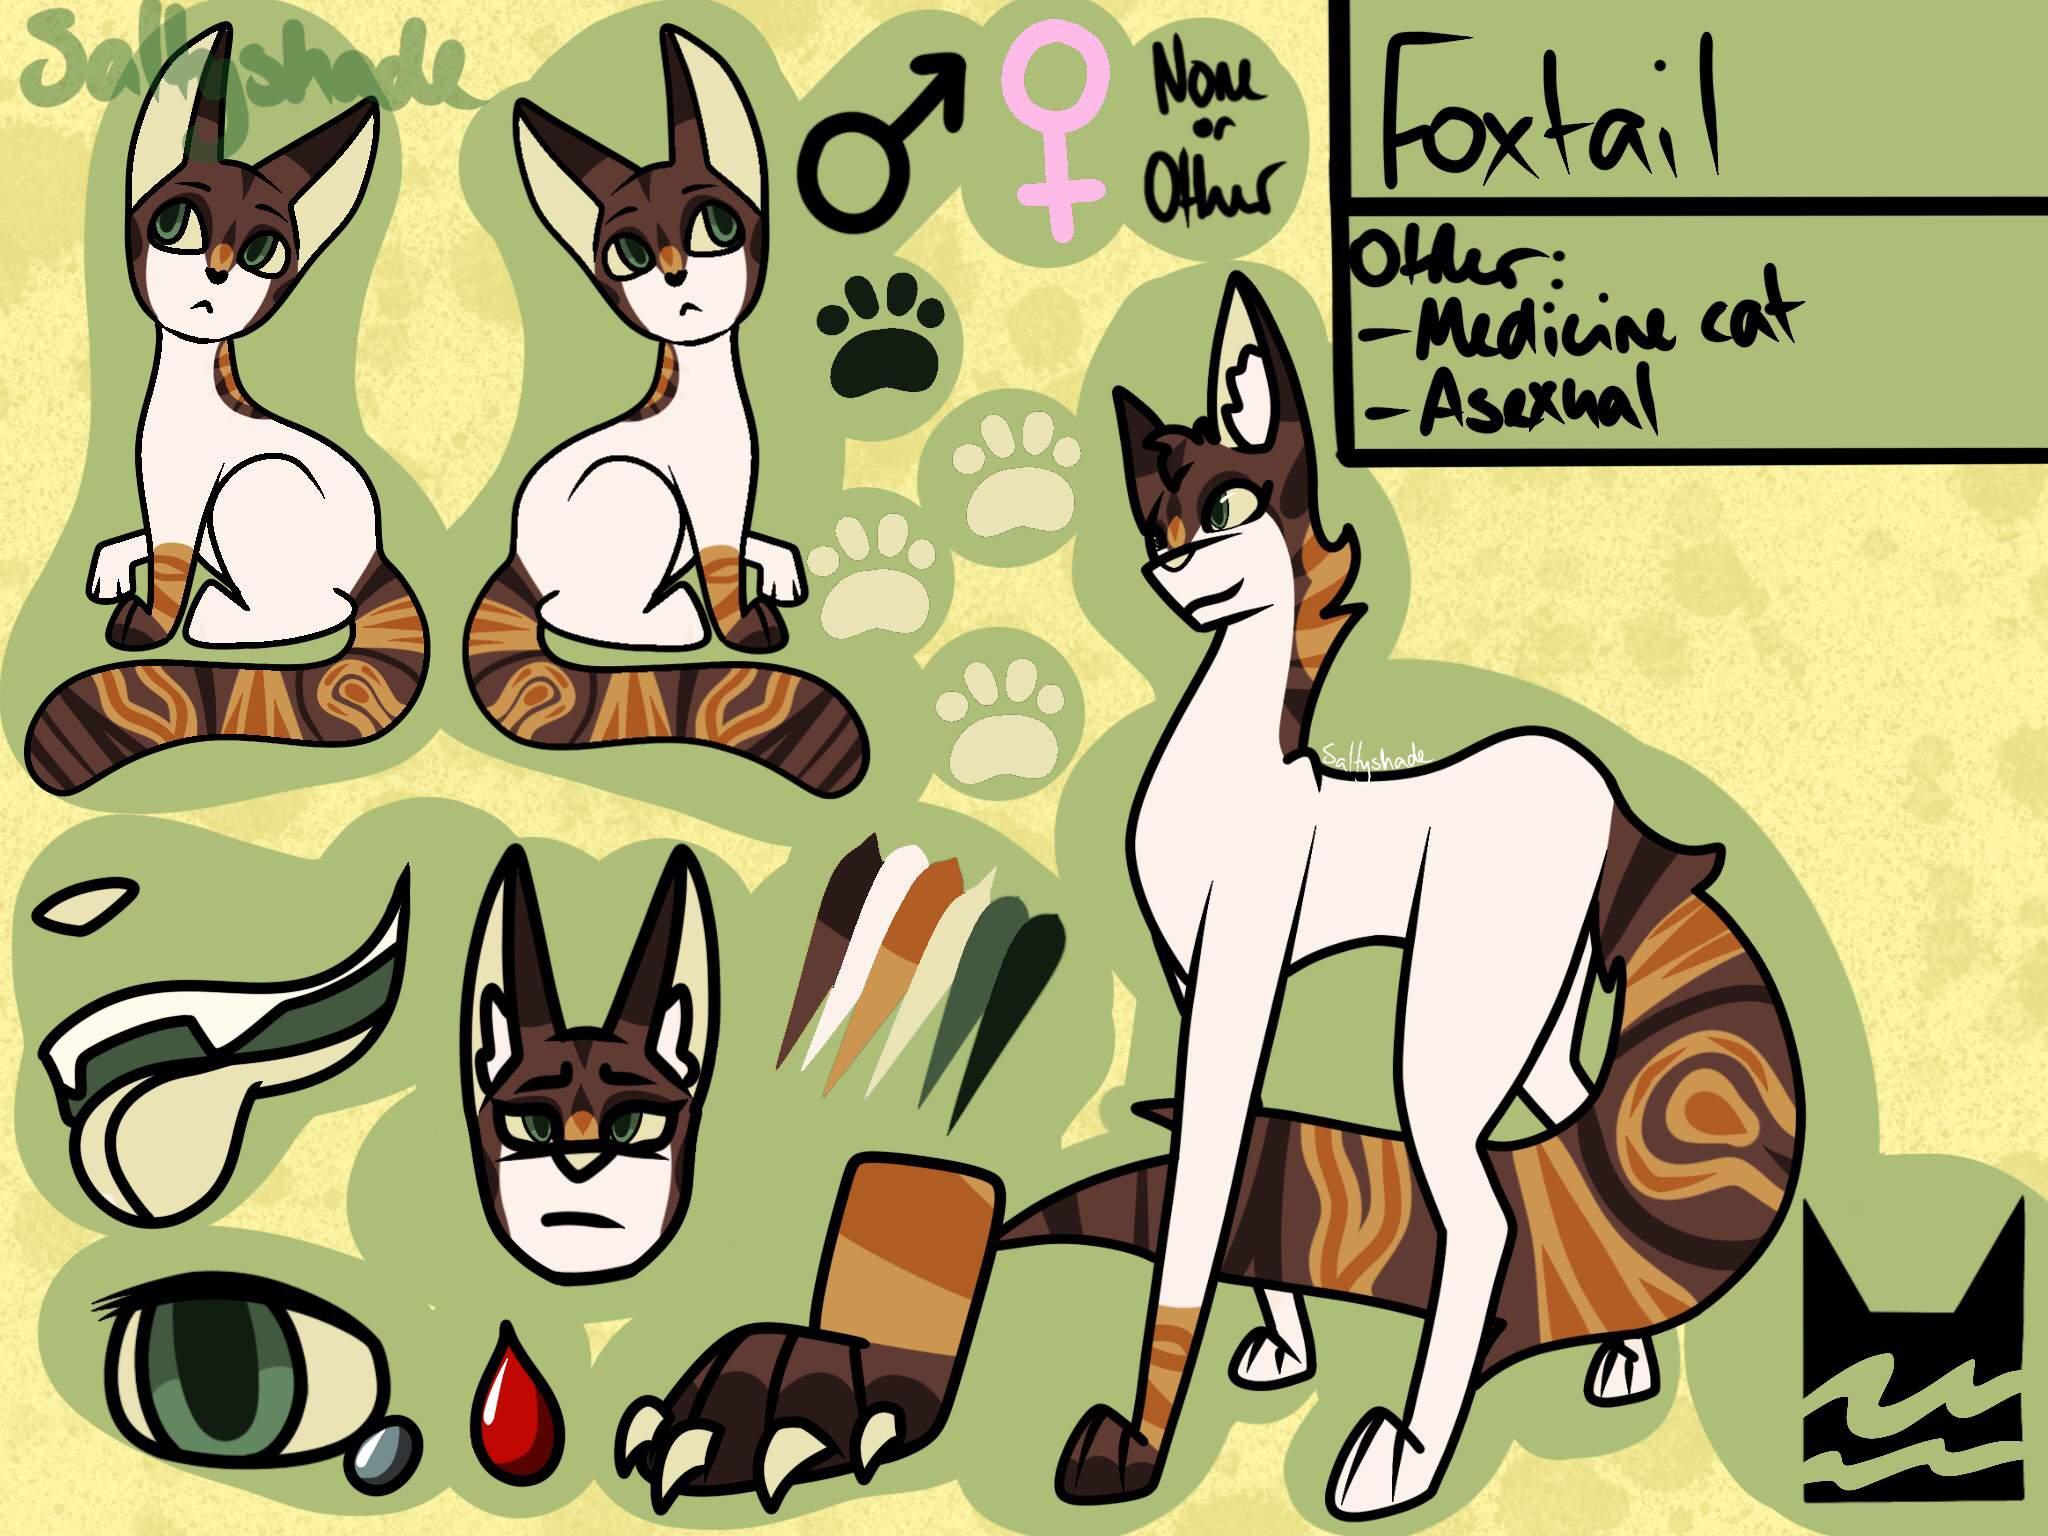 Foxtail Oc Wiki Warriors Amino